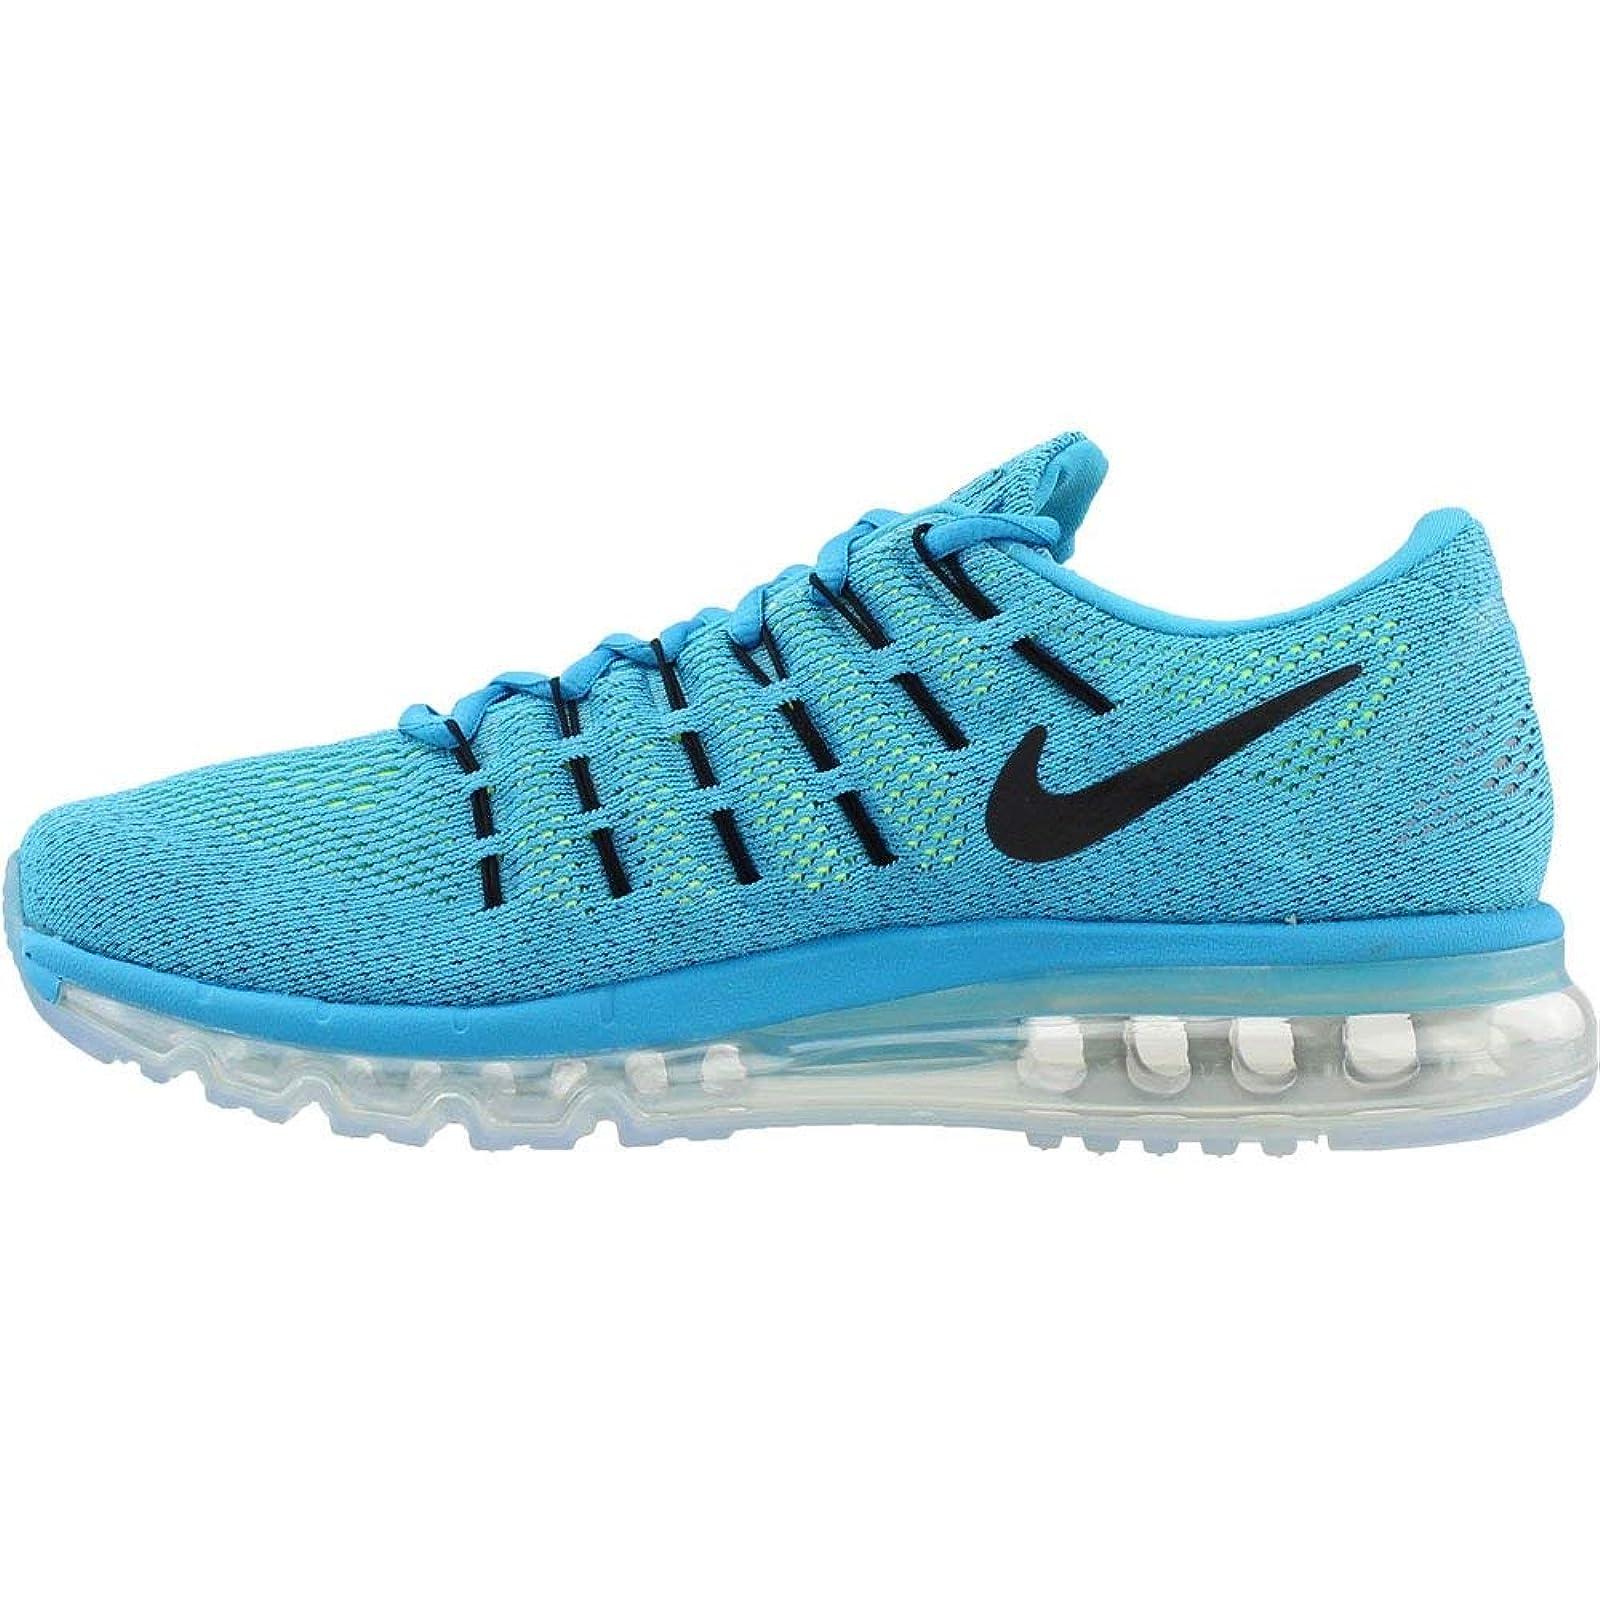 Nike Men's Air Max 2016 Running Shoe 8 M US - 3